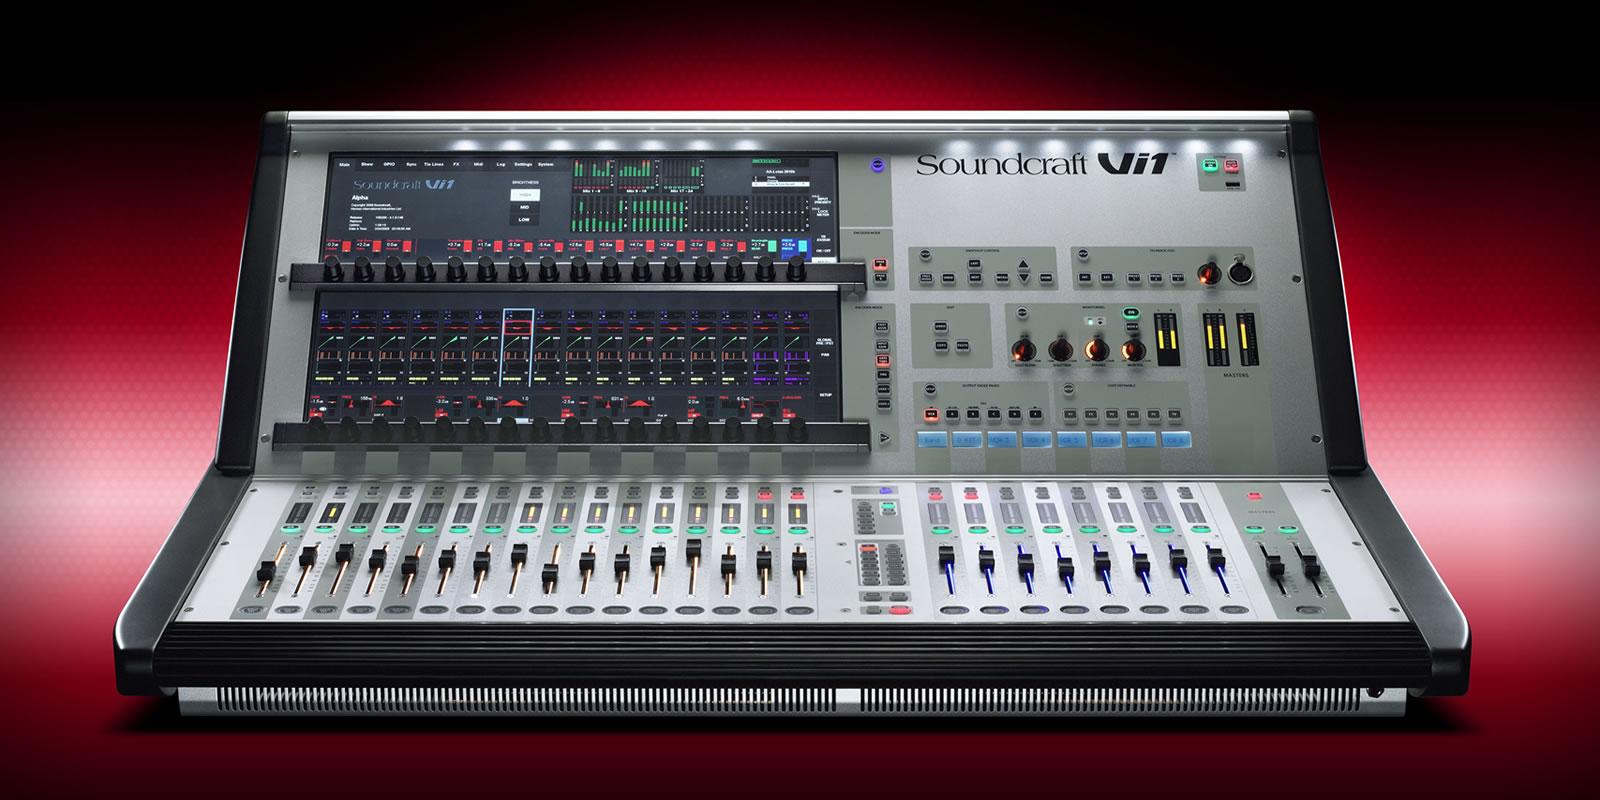 Vi1 | Soundcraft - Professional Audio Mixers